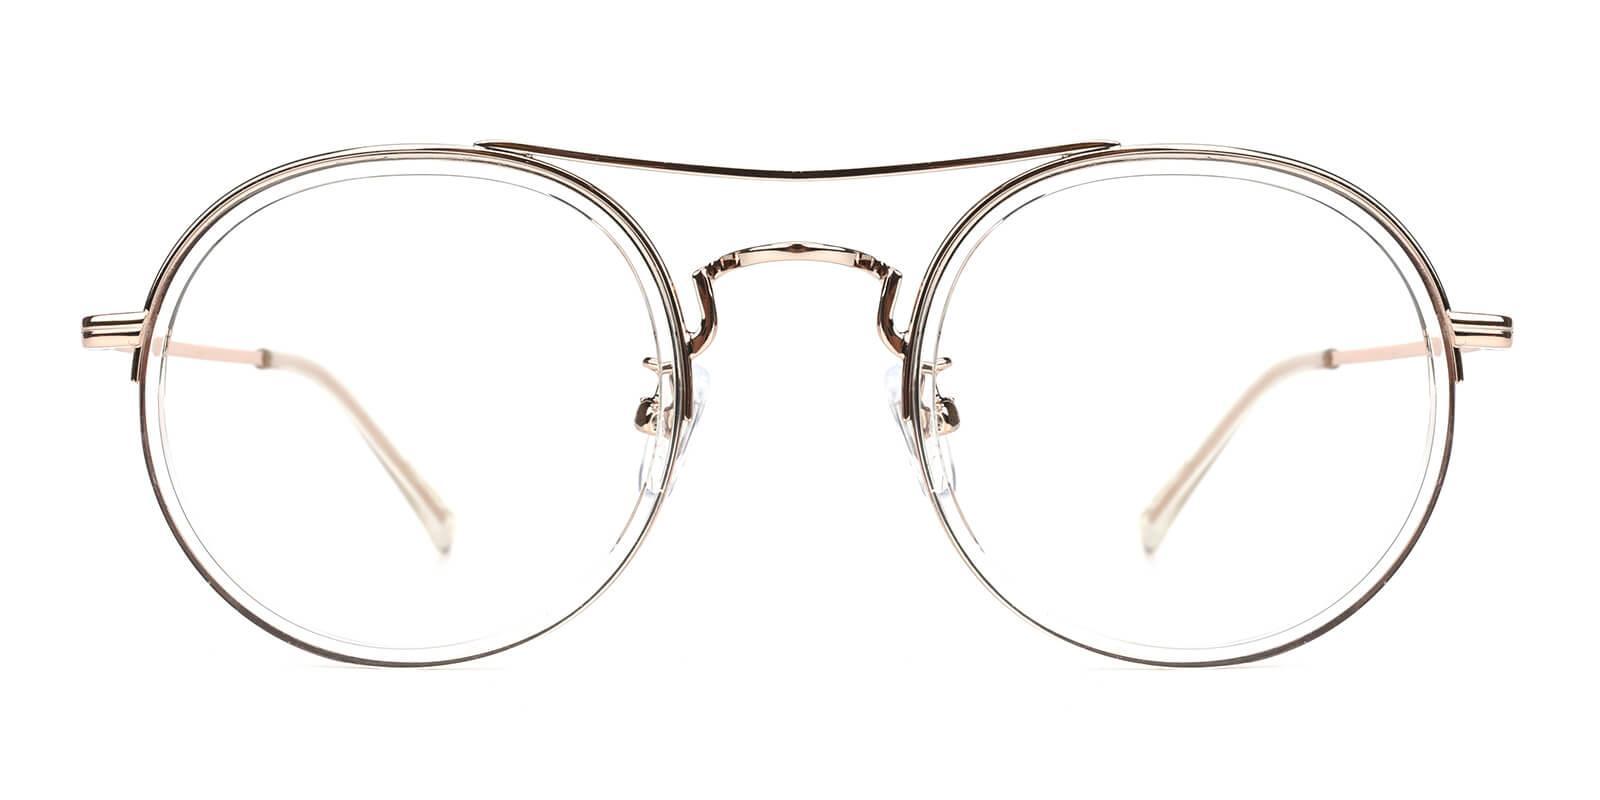 Teddy-Translucent-Aviator-Combination-Eyeglasses-additional2